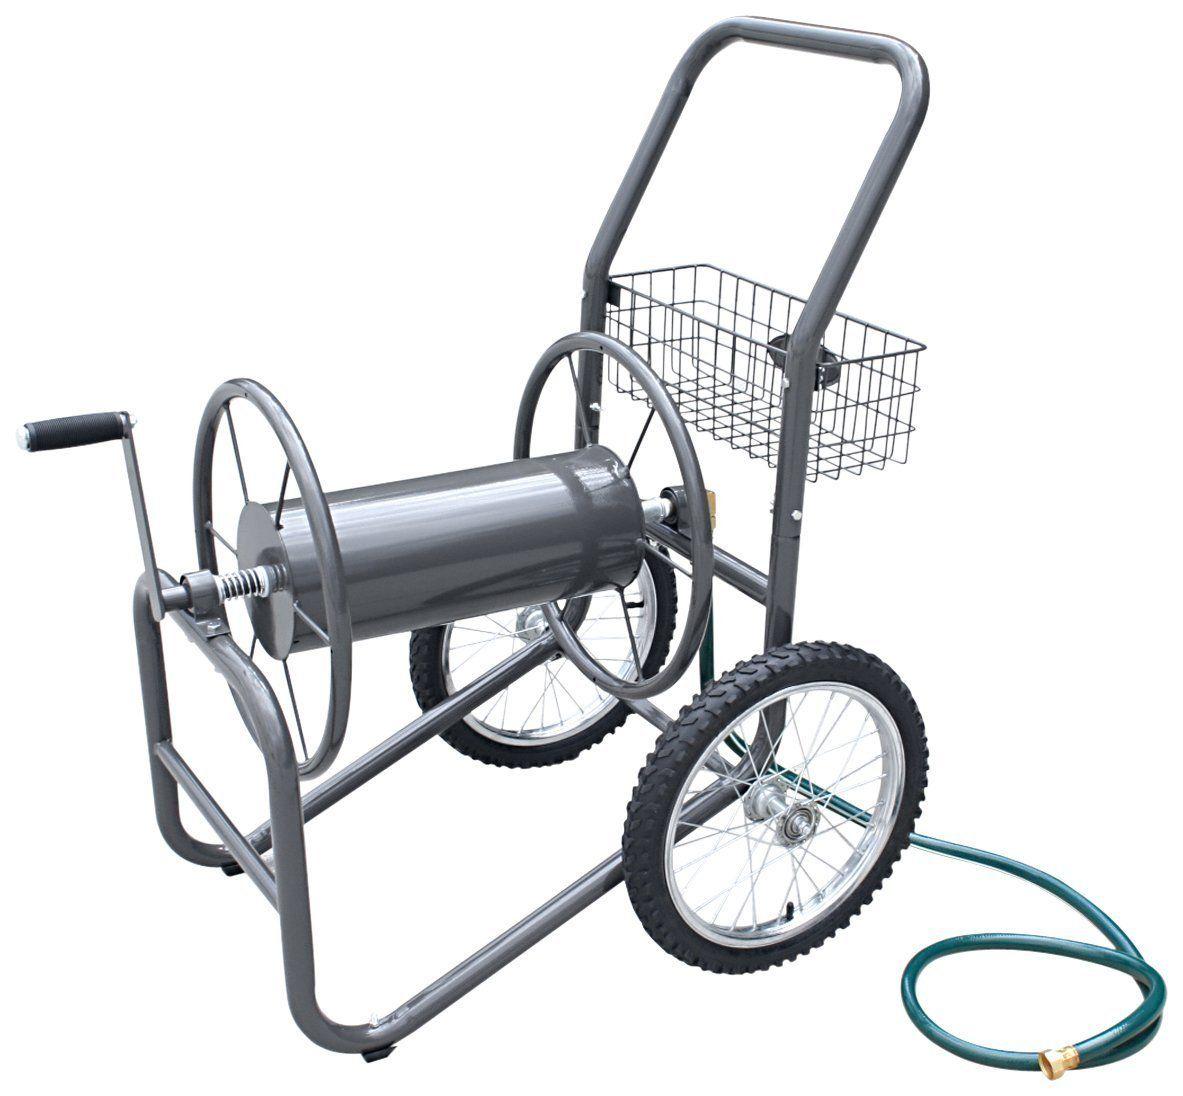 Garden Hose Cart With Wheels1